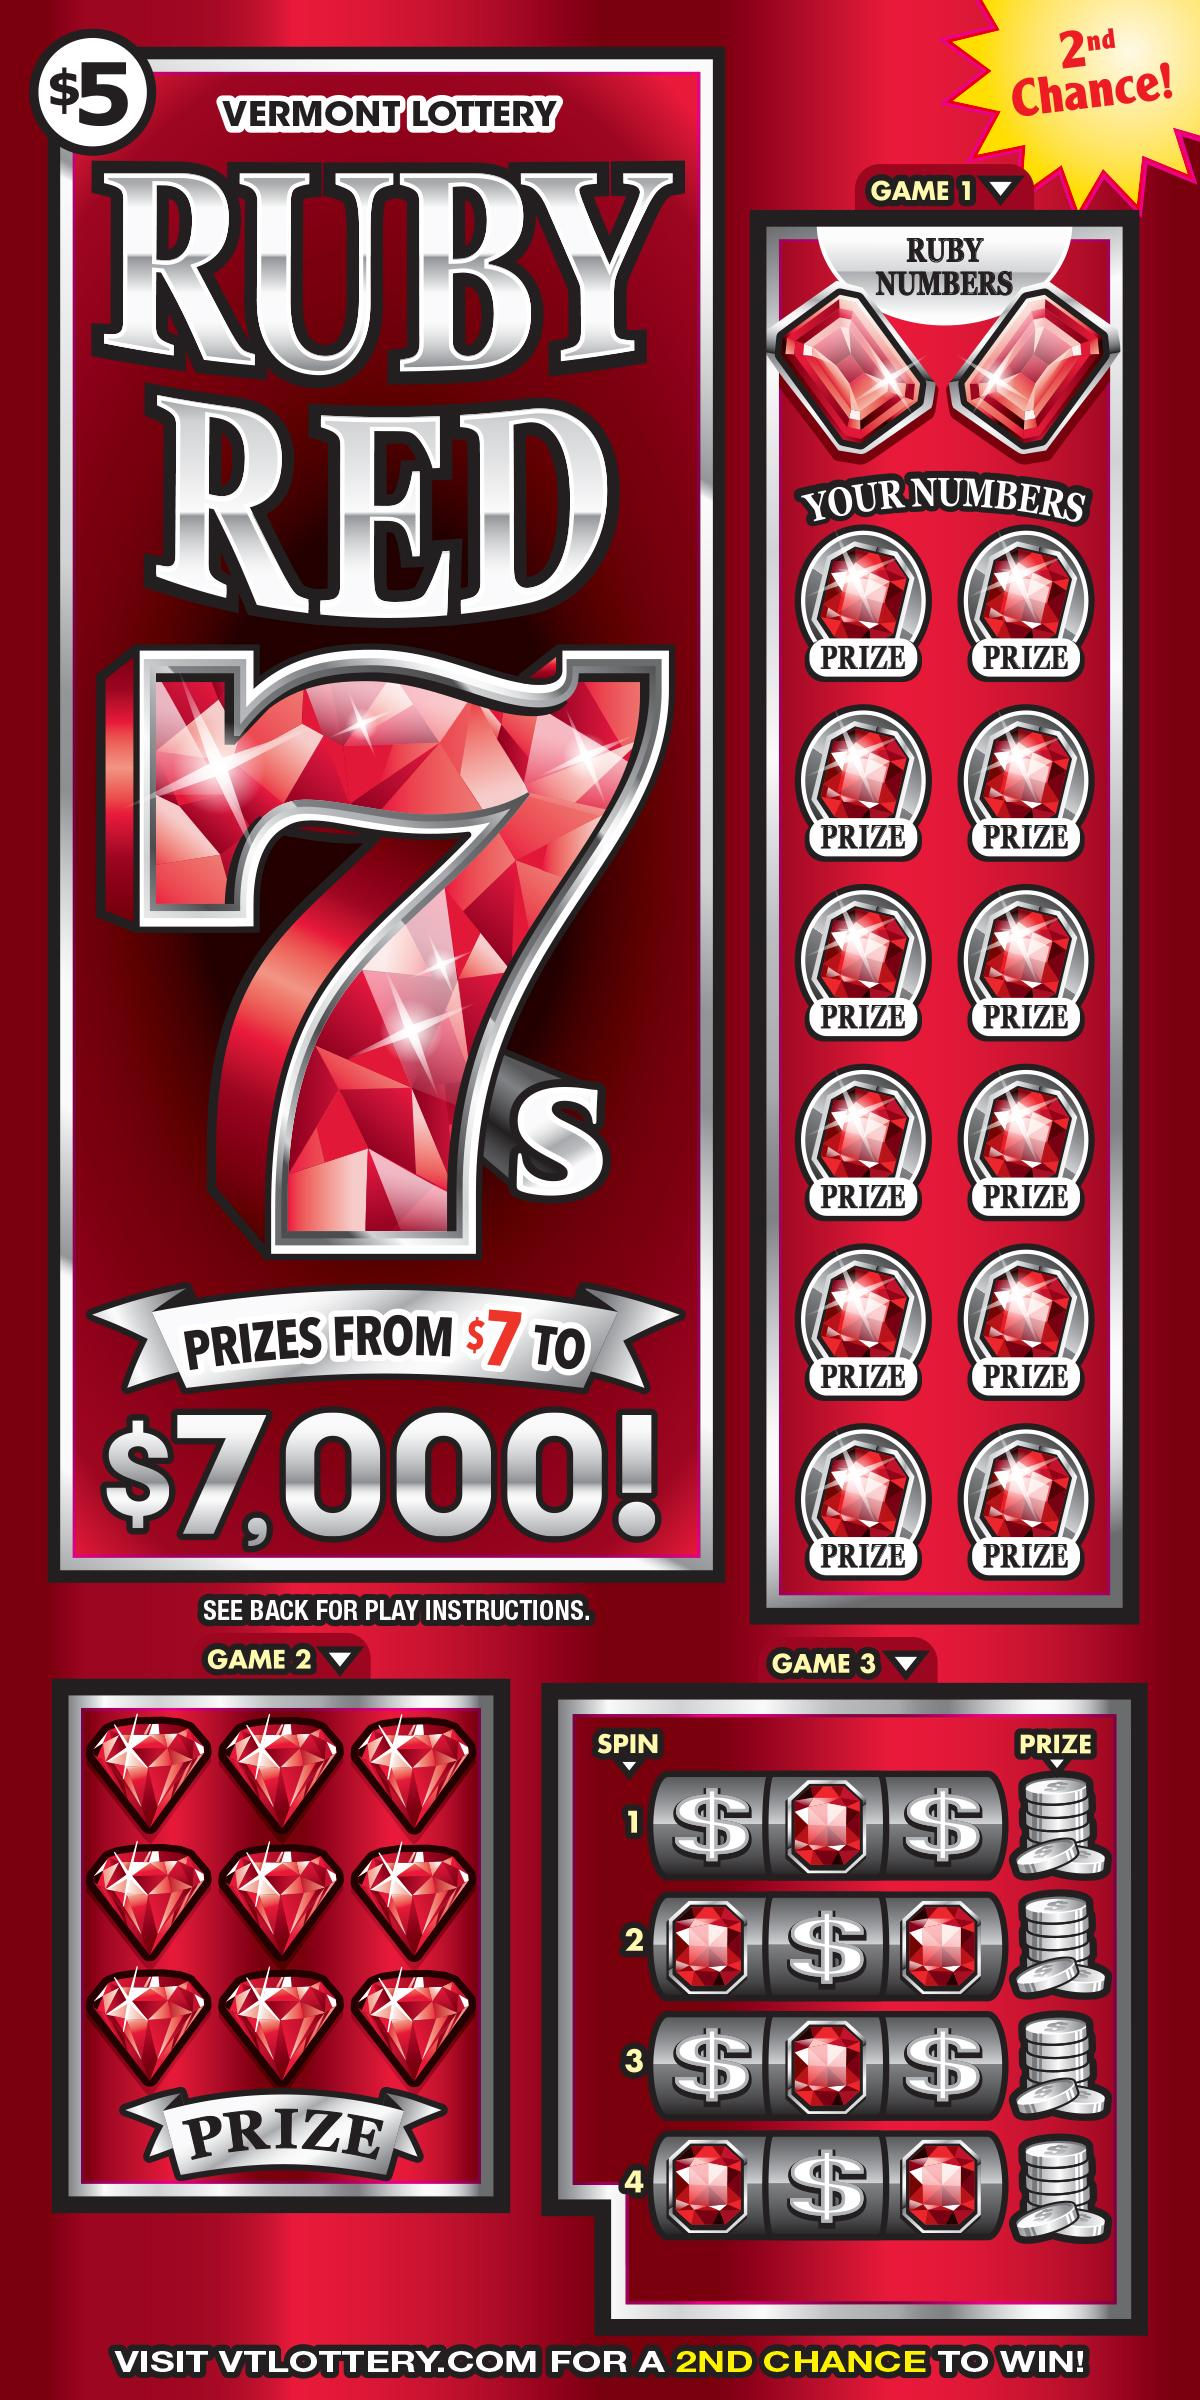 Vt Lottery